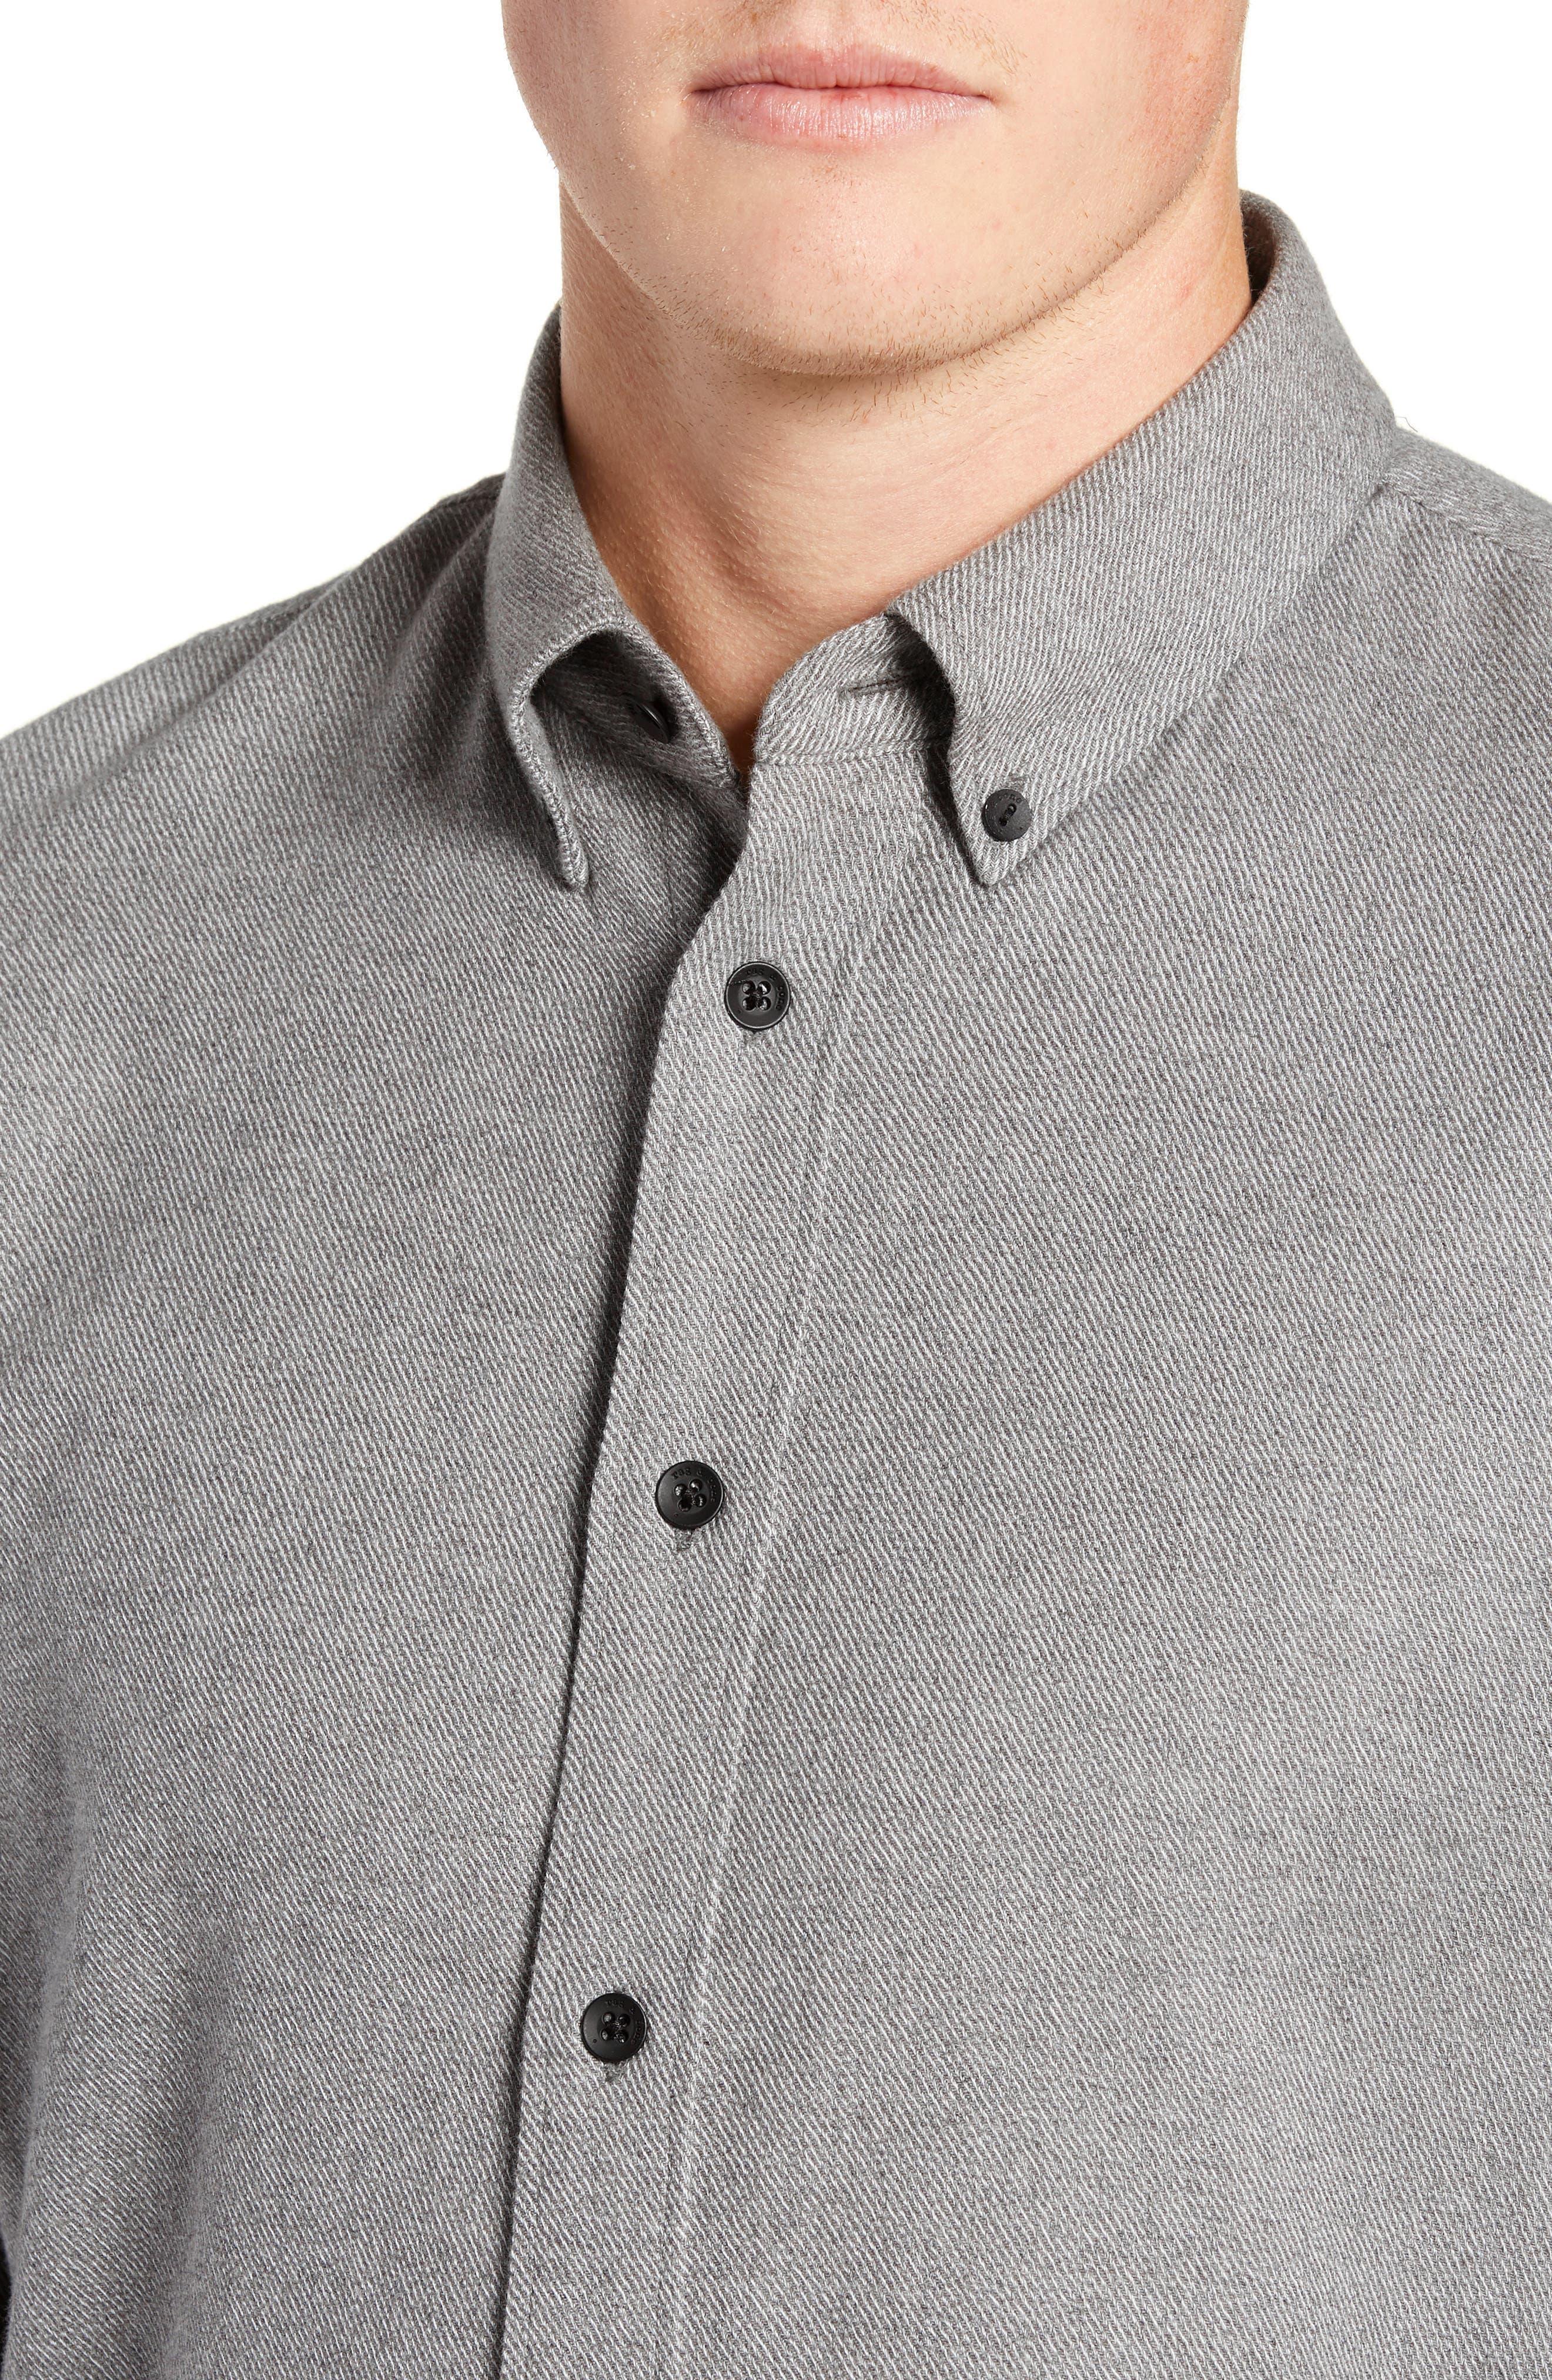 Fit 2 Tomlin Twill Sport Shirt,                             Alternate thumbnail 2, color,                             GREY